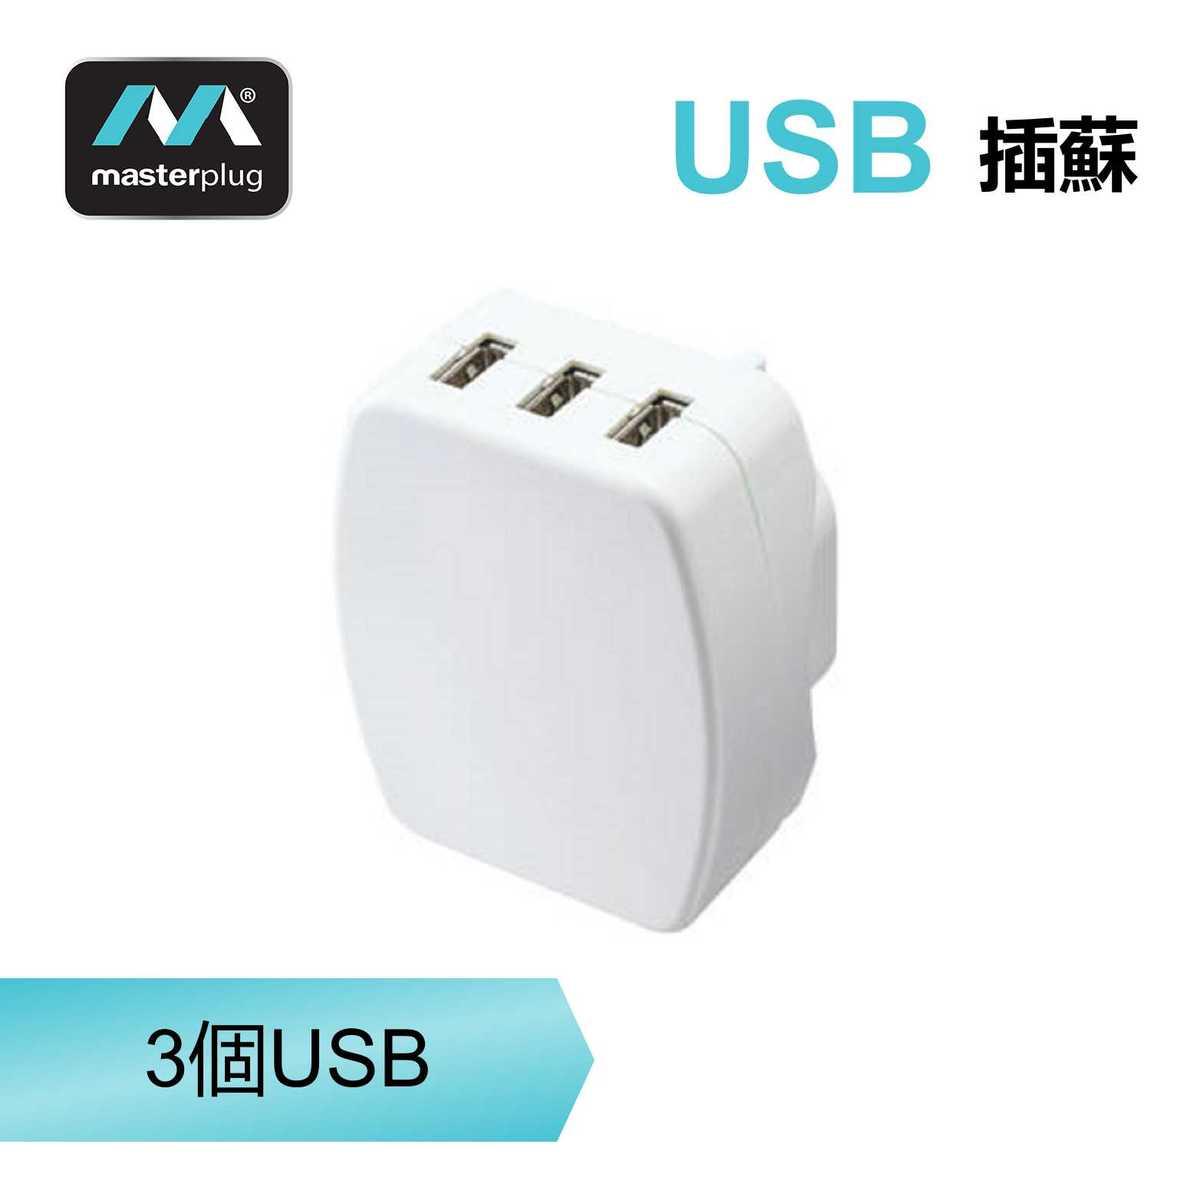 USB Plug 3 x USB 3.4 A Output (Model:USBPLGW3-MP)